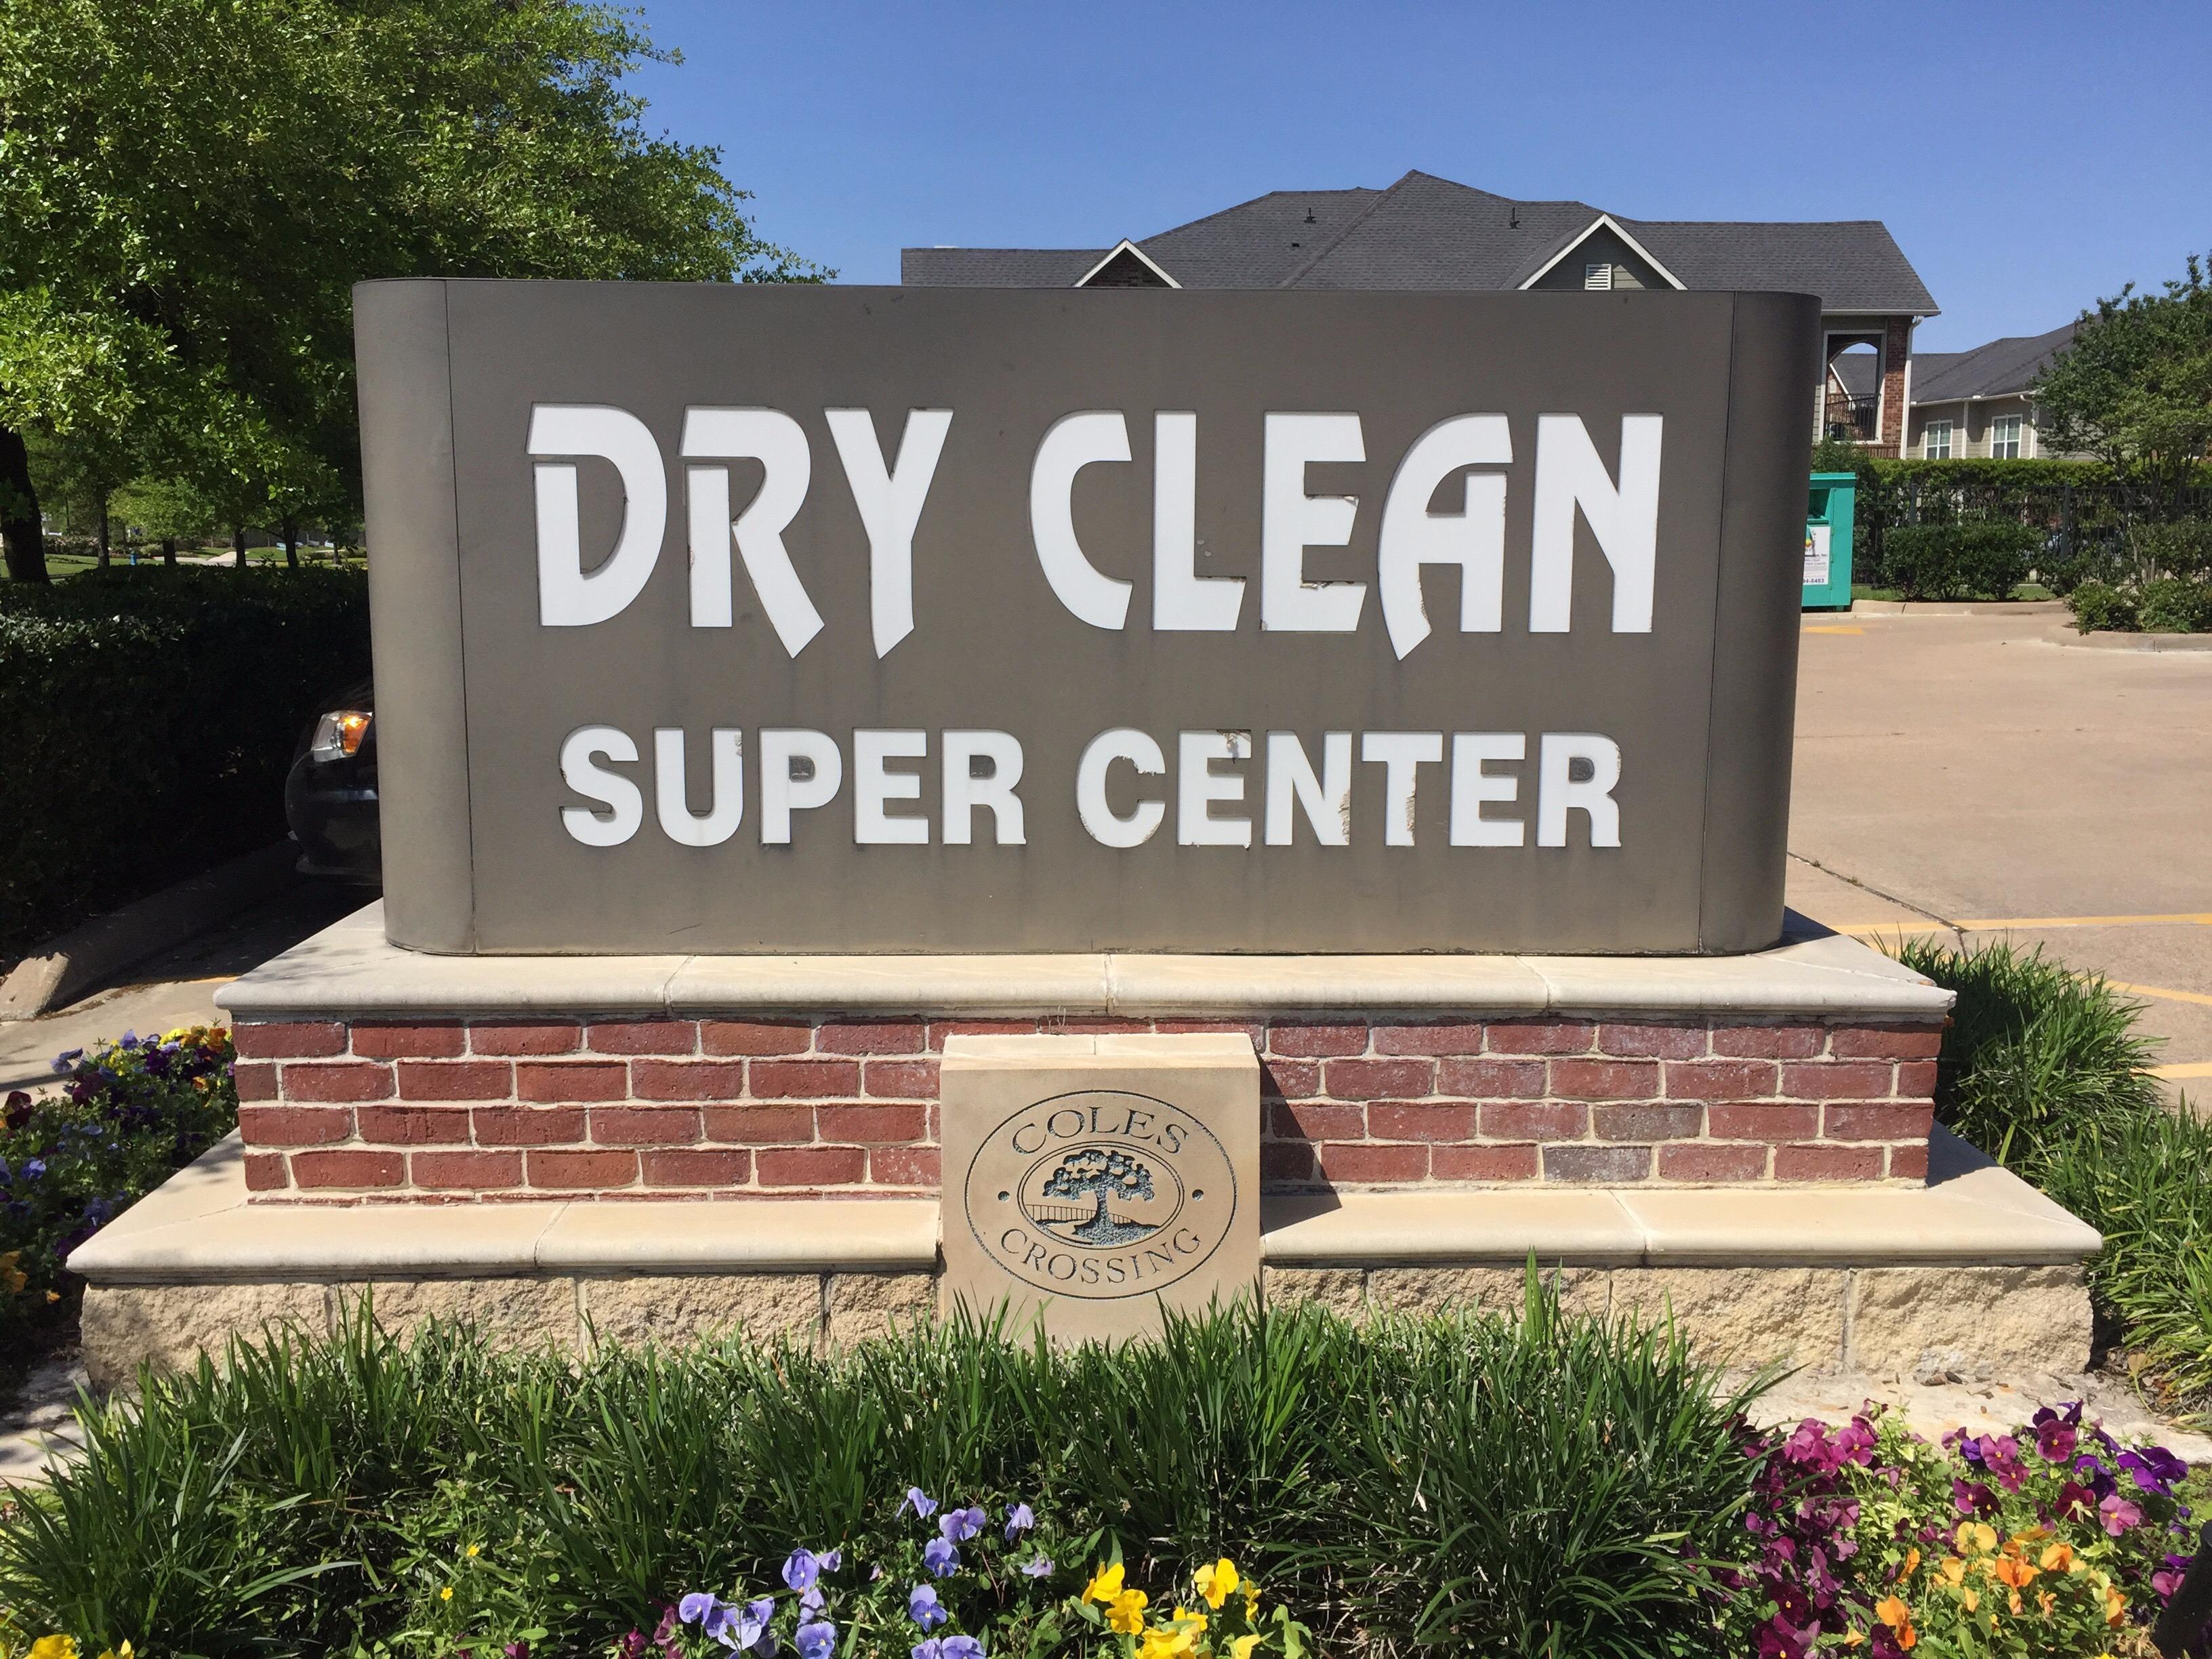 Dry Clean Super Center image 3